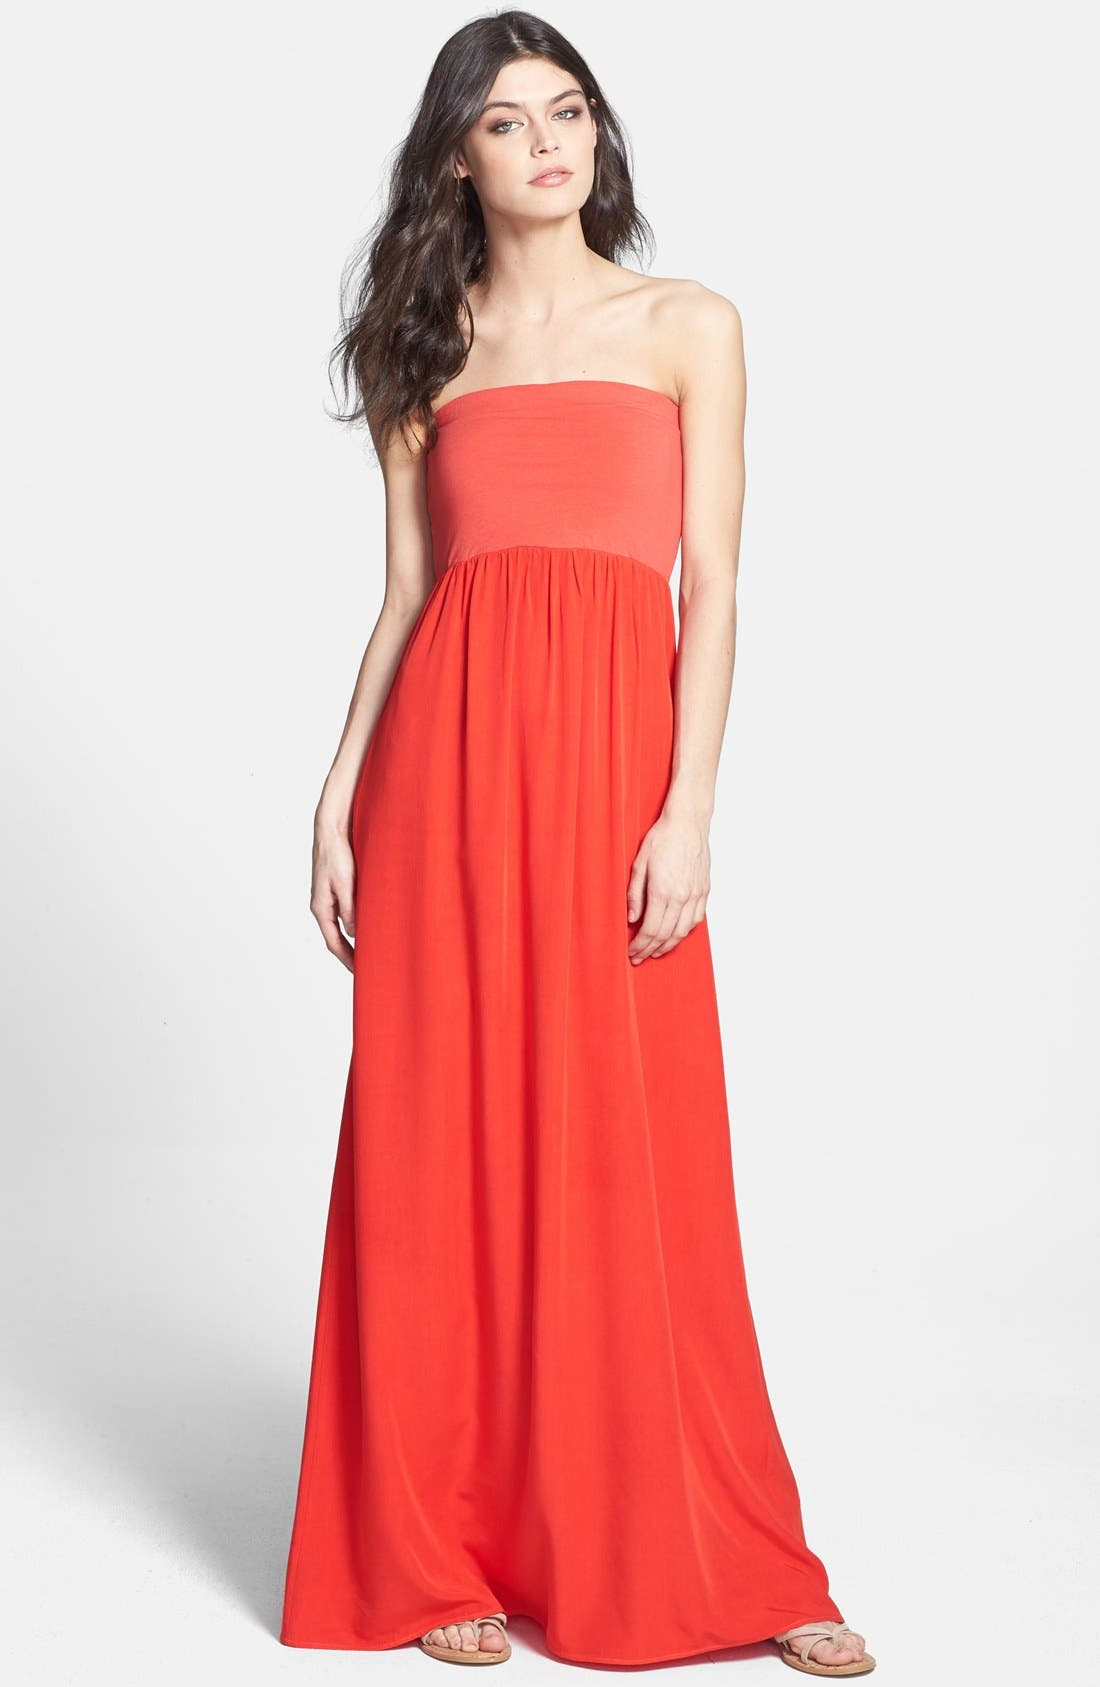 Alternate Image 1 Selected - Splendid Strapless Knit Maxi Dress